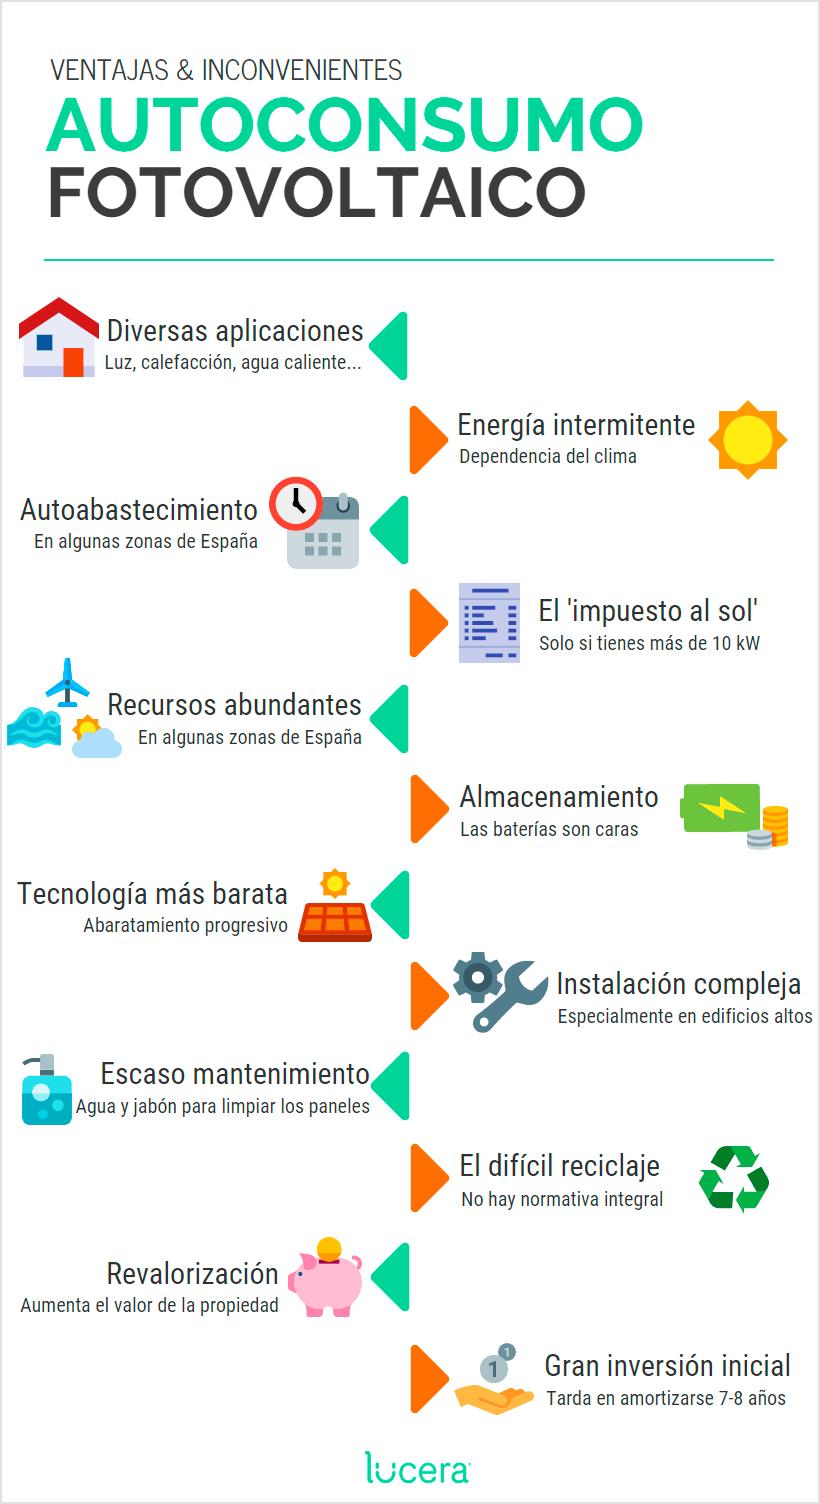 infografia-ventajas-e-inconvenientes-del-consumo-fotovoltaico